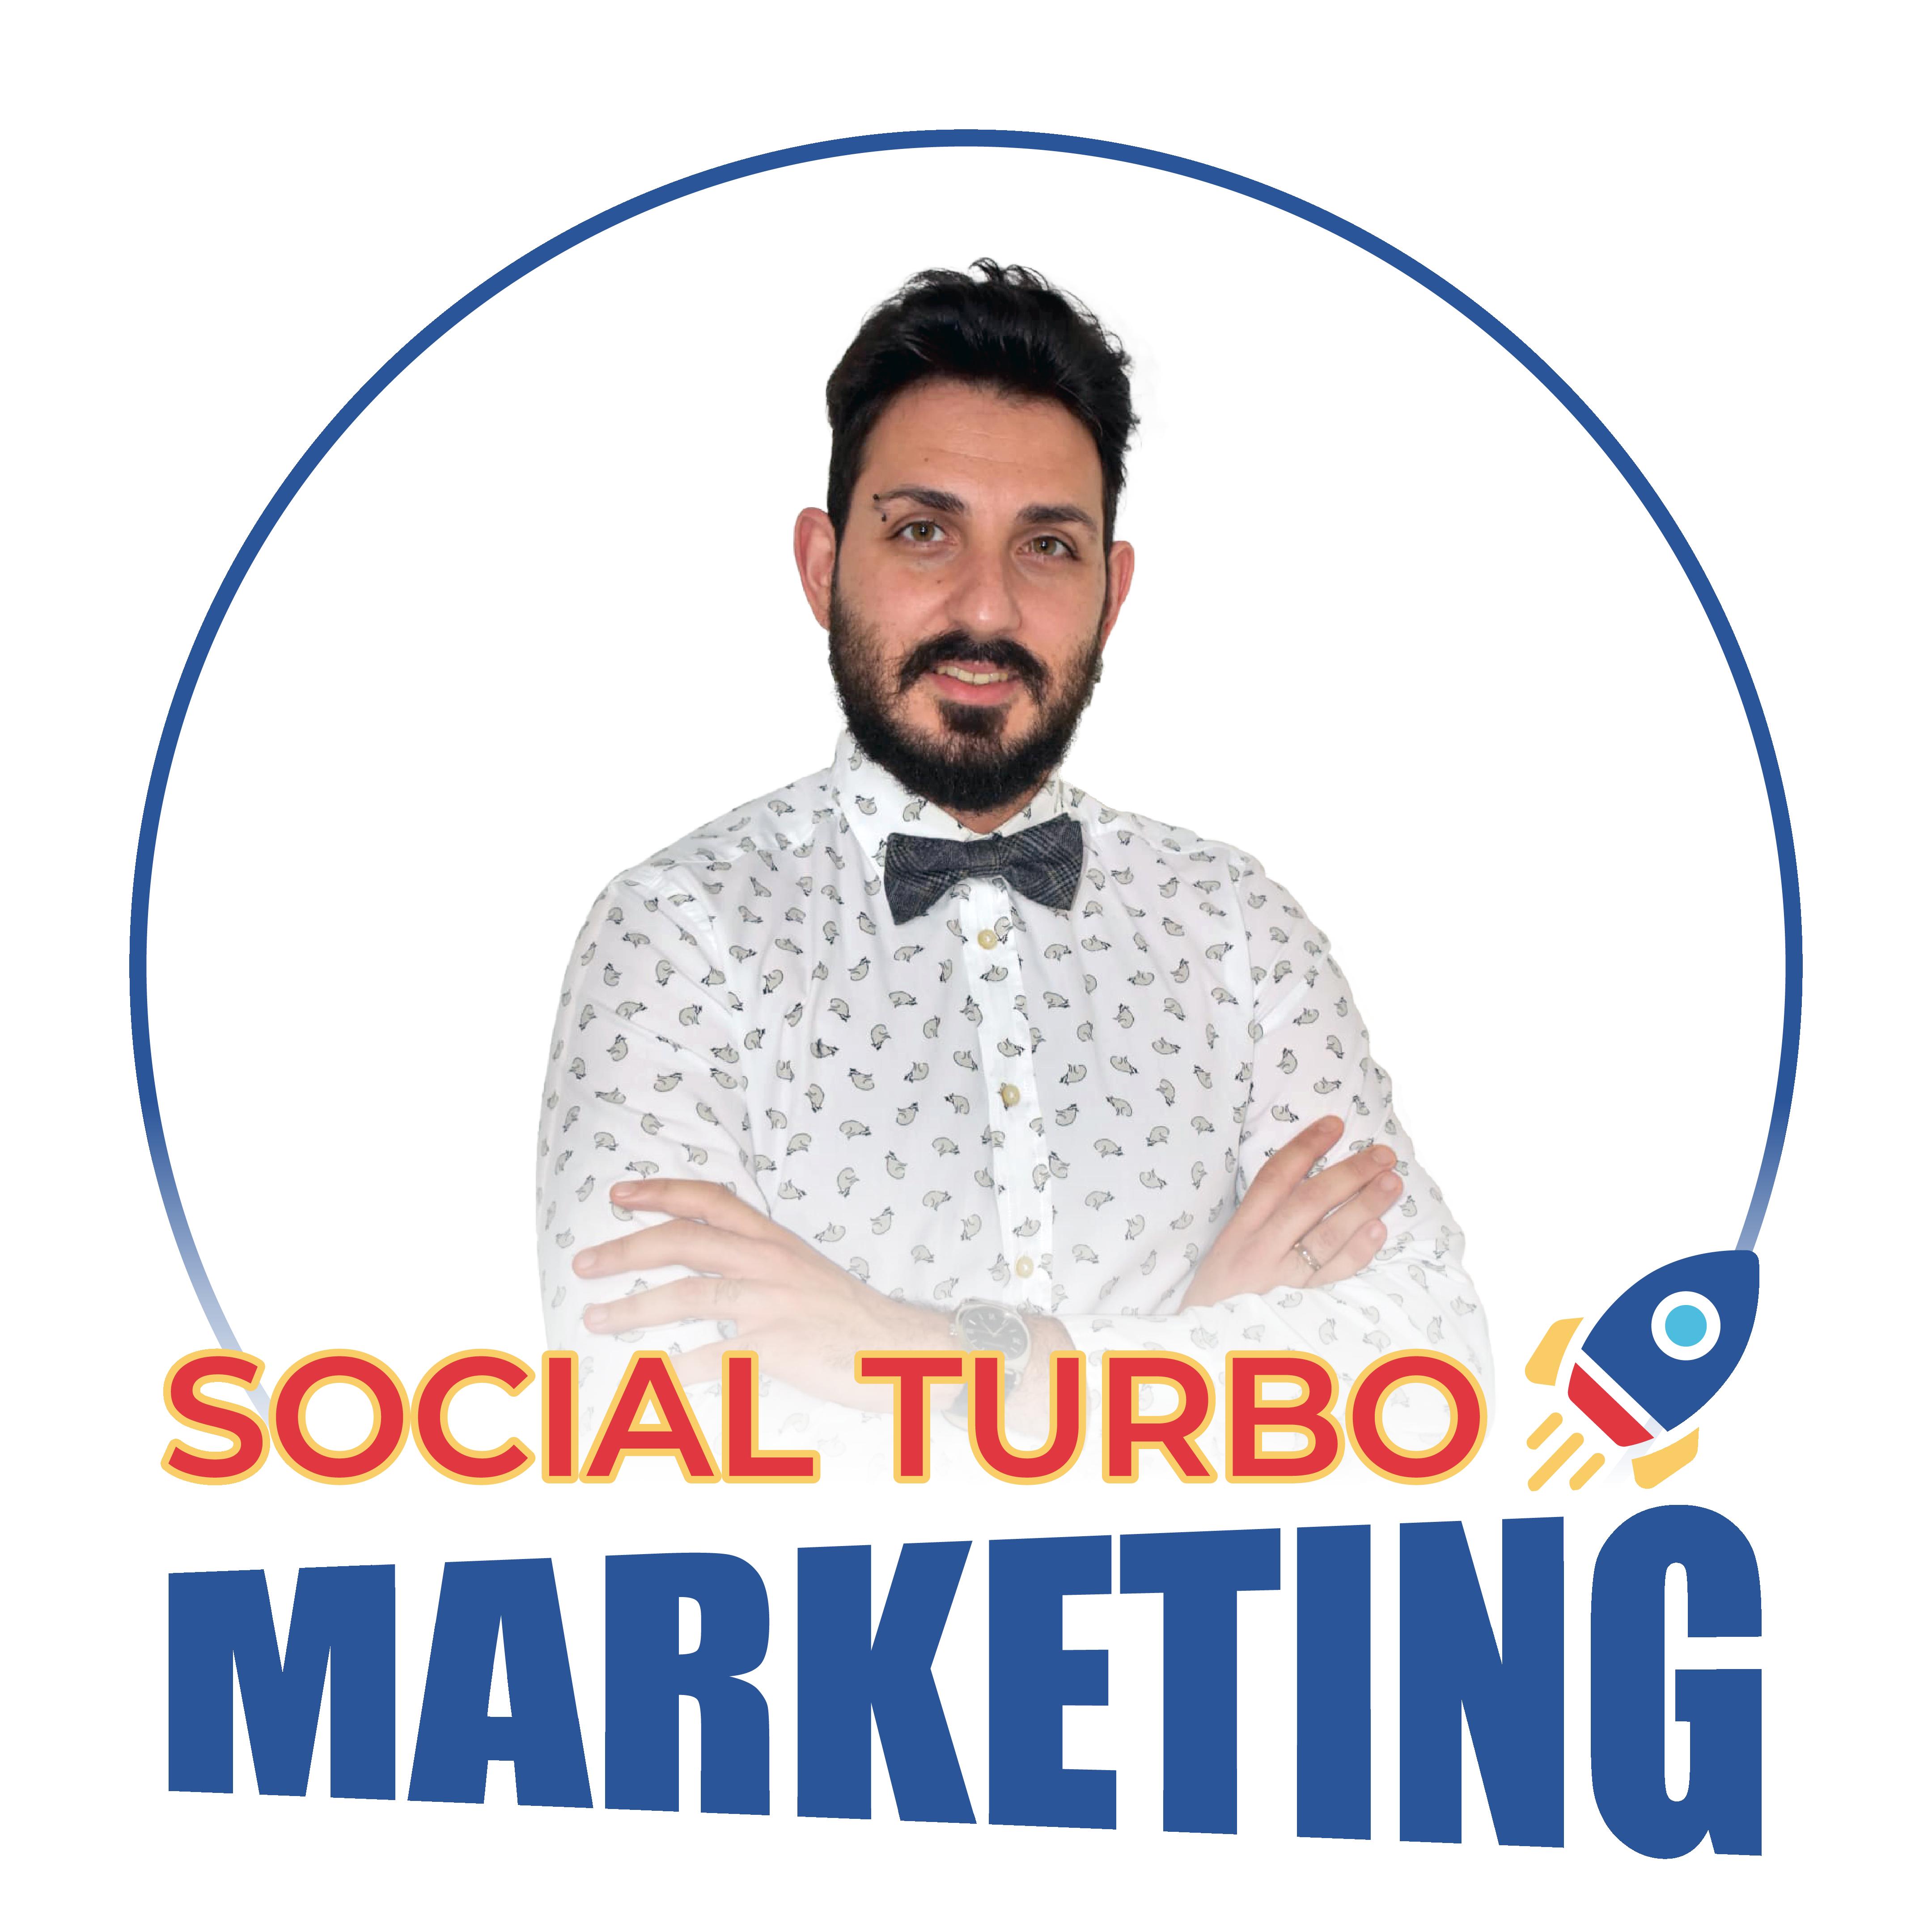 Social turbo marketing